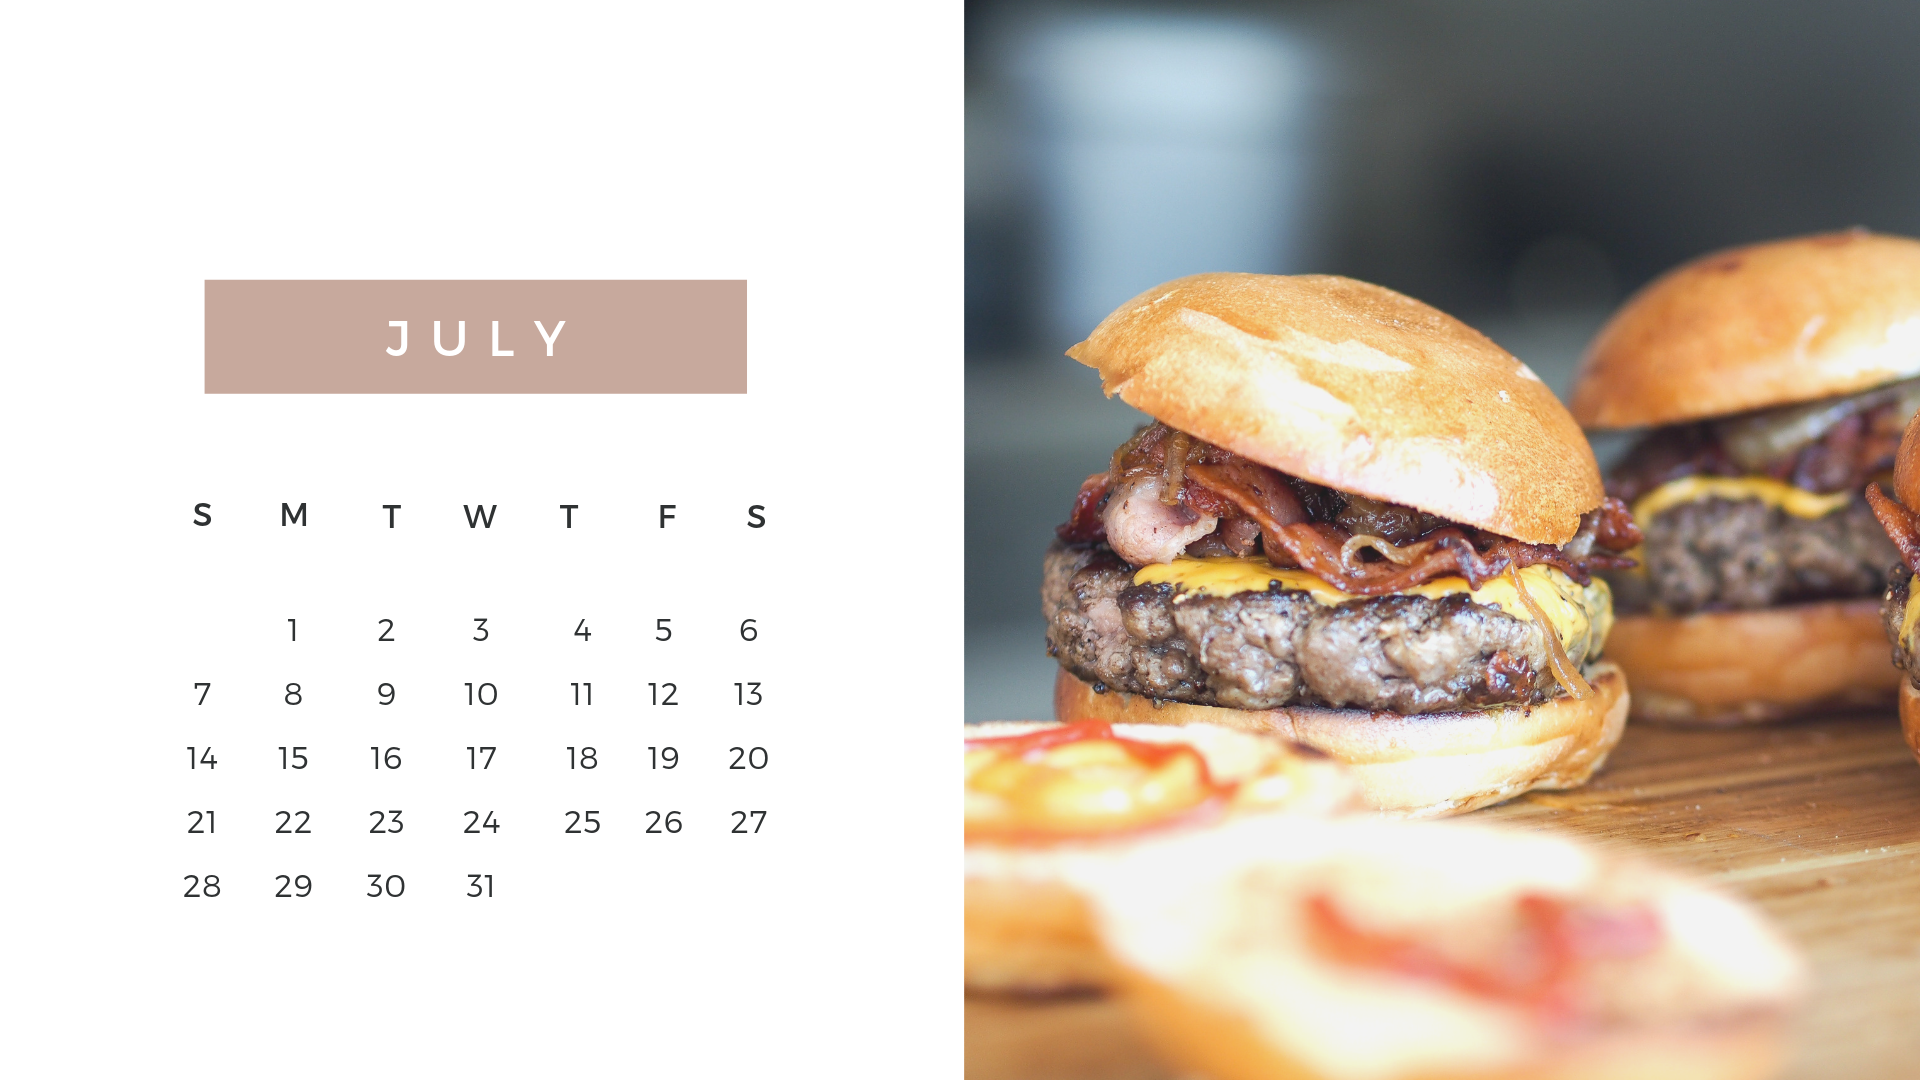 chicago-festival-calendar-july-kourtney-murray-chicago-real-estate.png